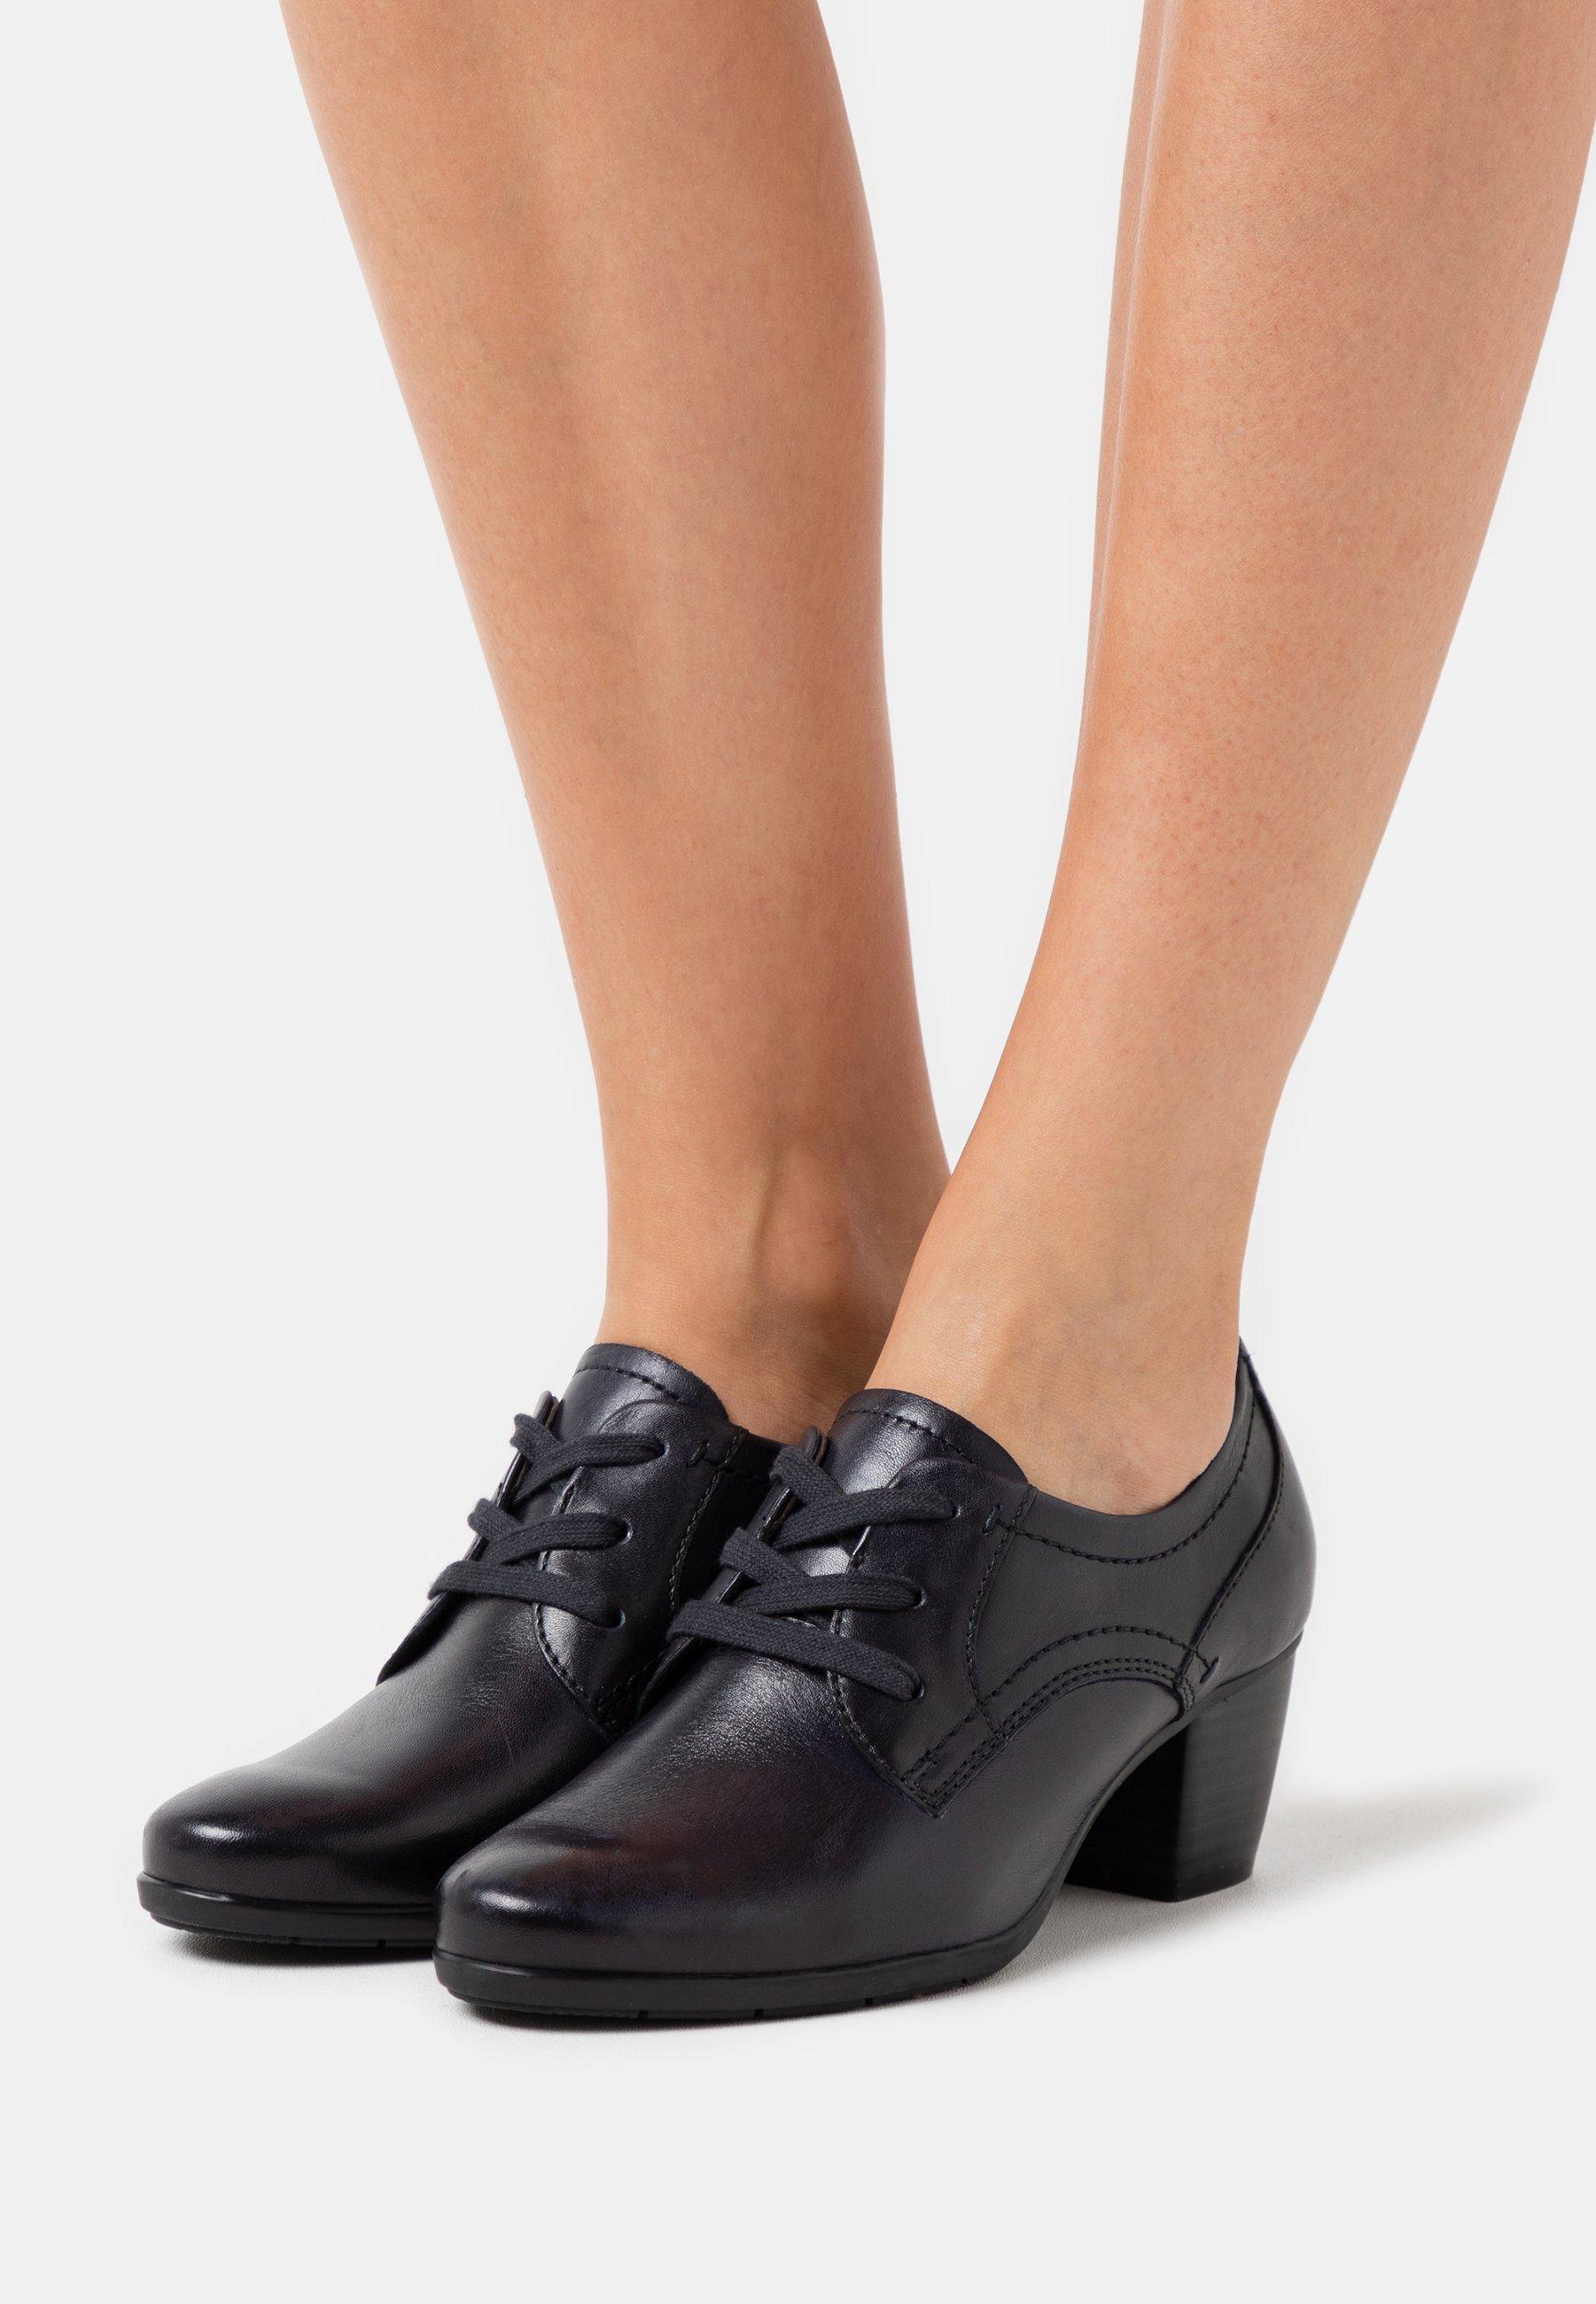 Shopping Fashion Style Women's Shoes Jana Ankle boots navy 9LUxUNdKJ 94uytCBJM